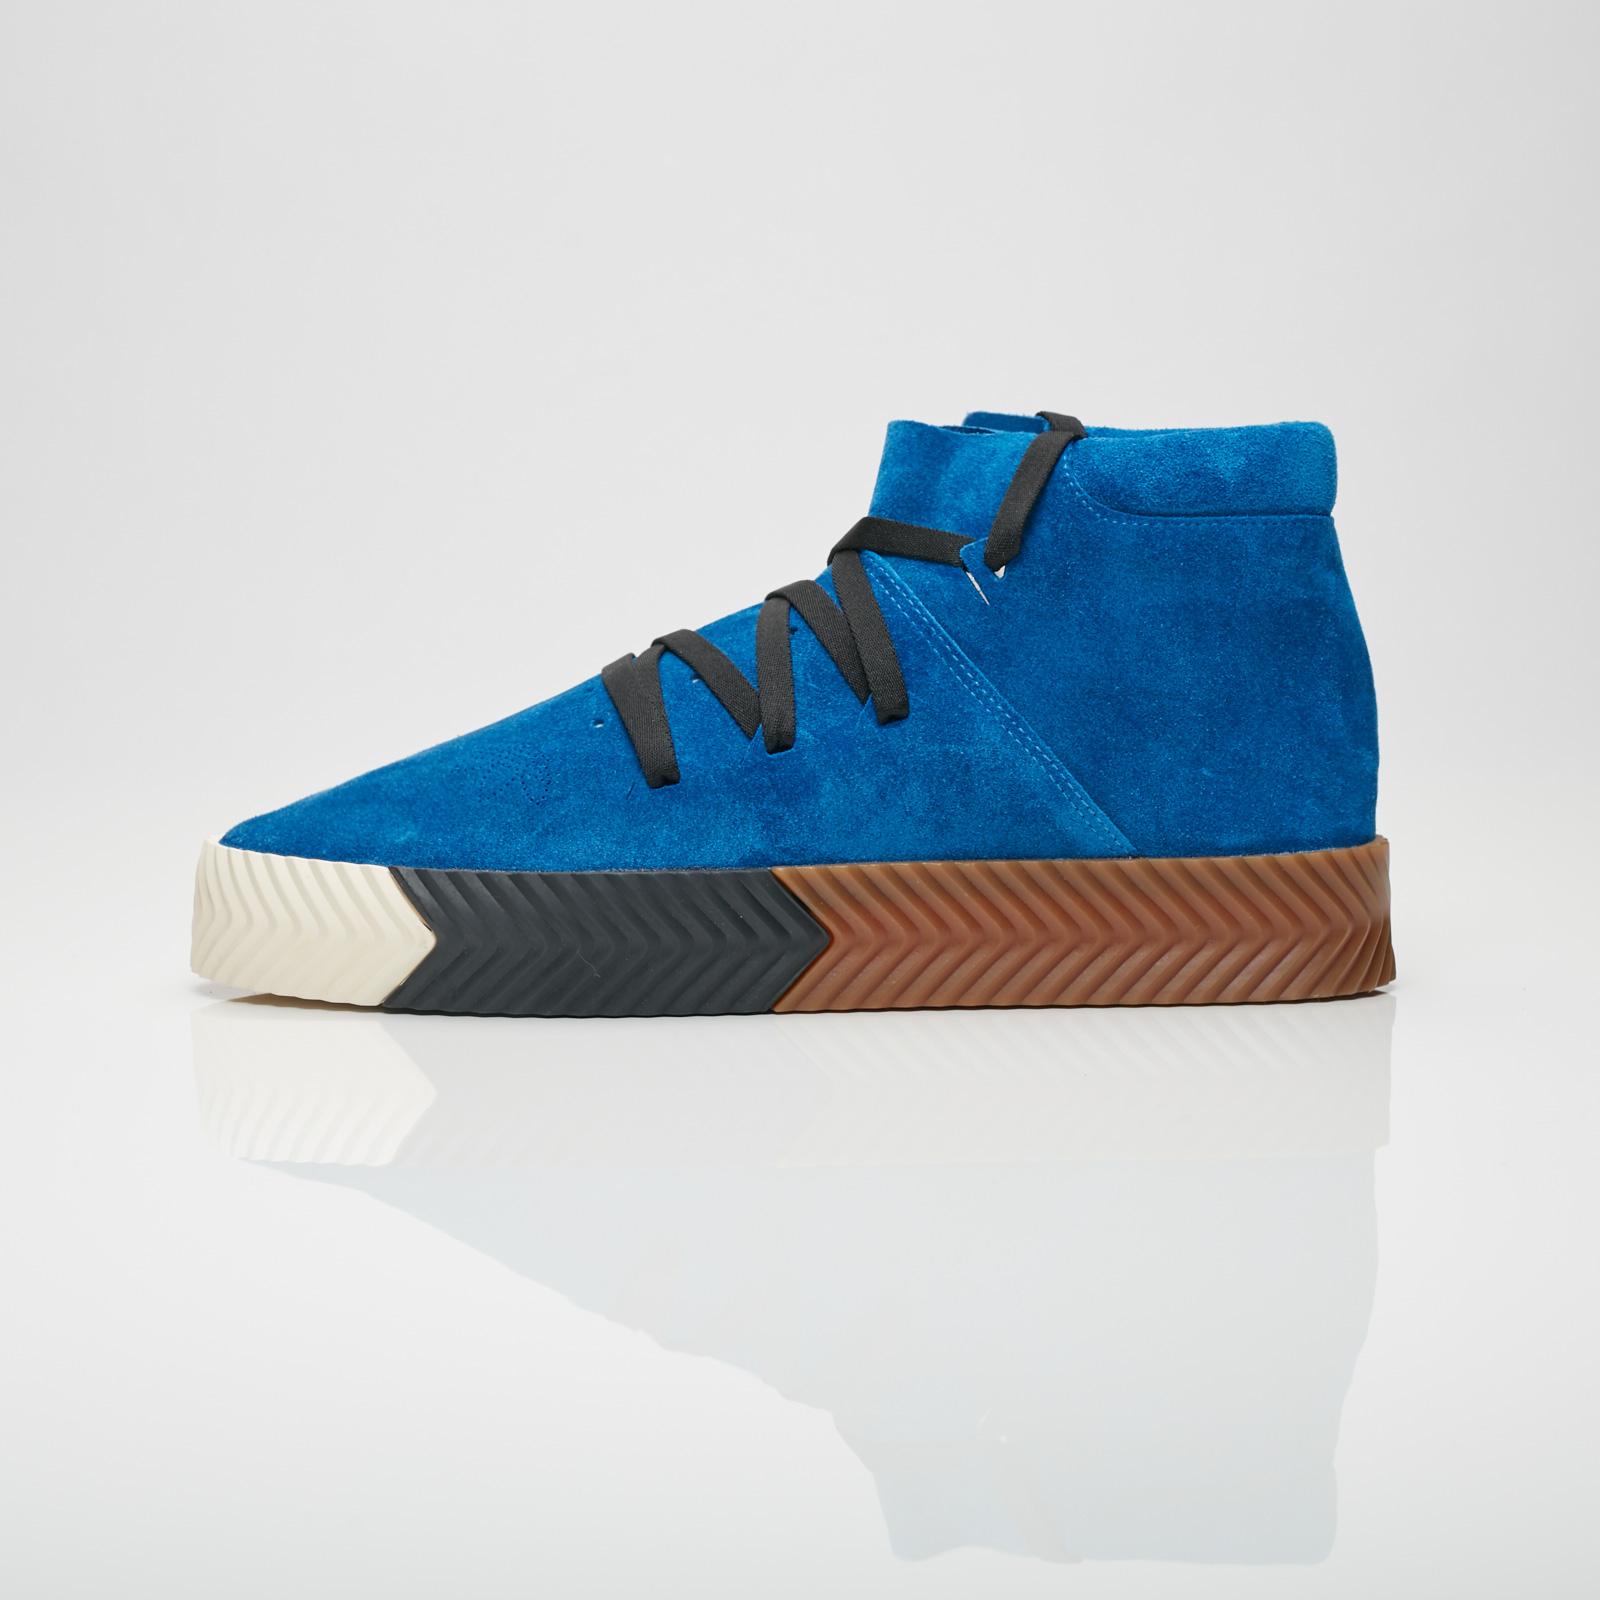 hot sale online 12471 58733 ... adidas Originals by Alexander Wang Skate Shoes ...